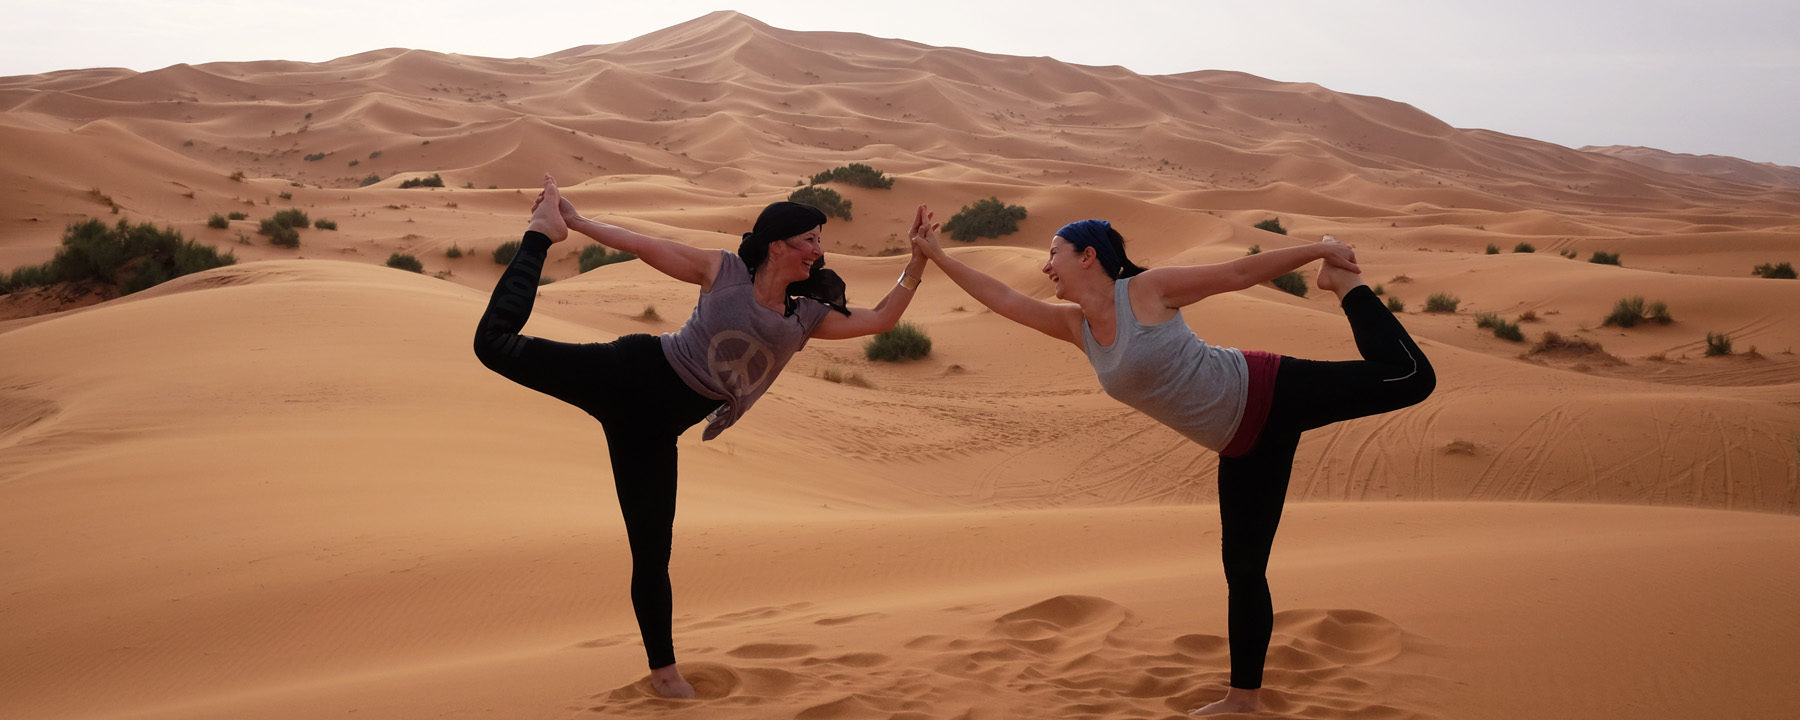 wuesten-yoga-retreat-marokko_source-nosade